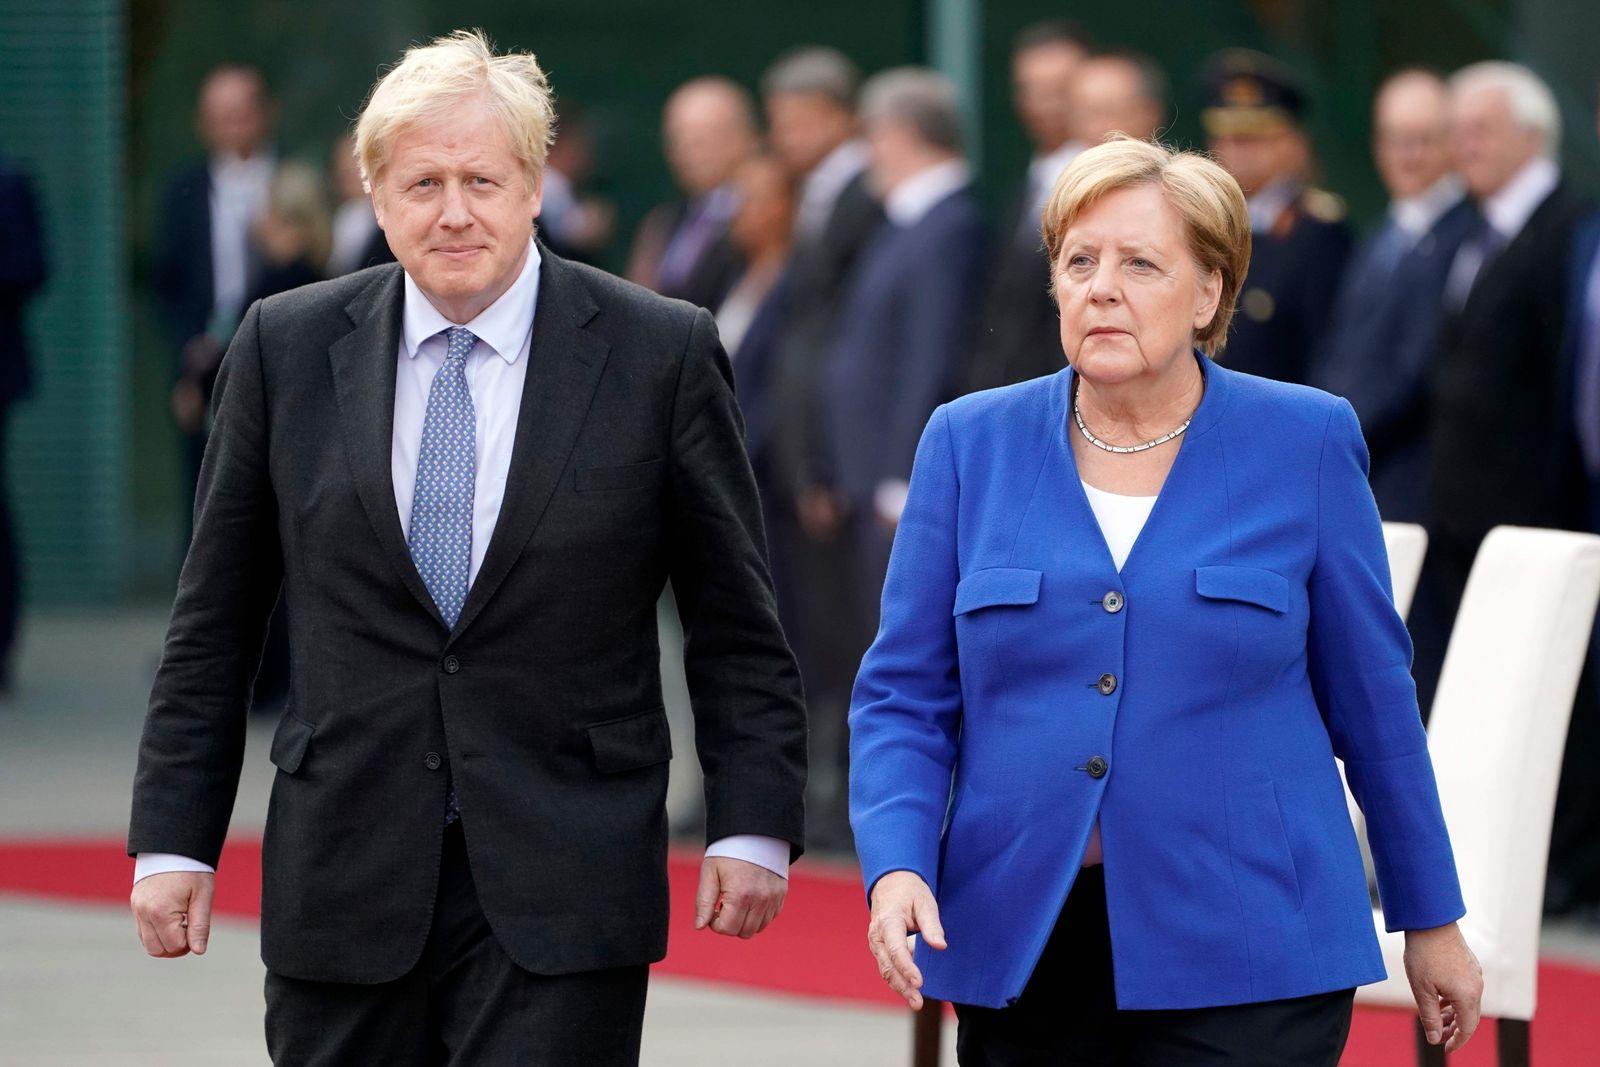 Johnson & Merkel